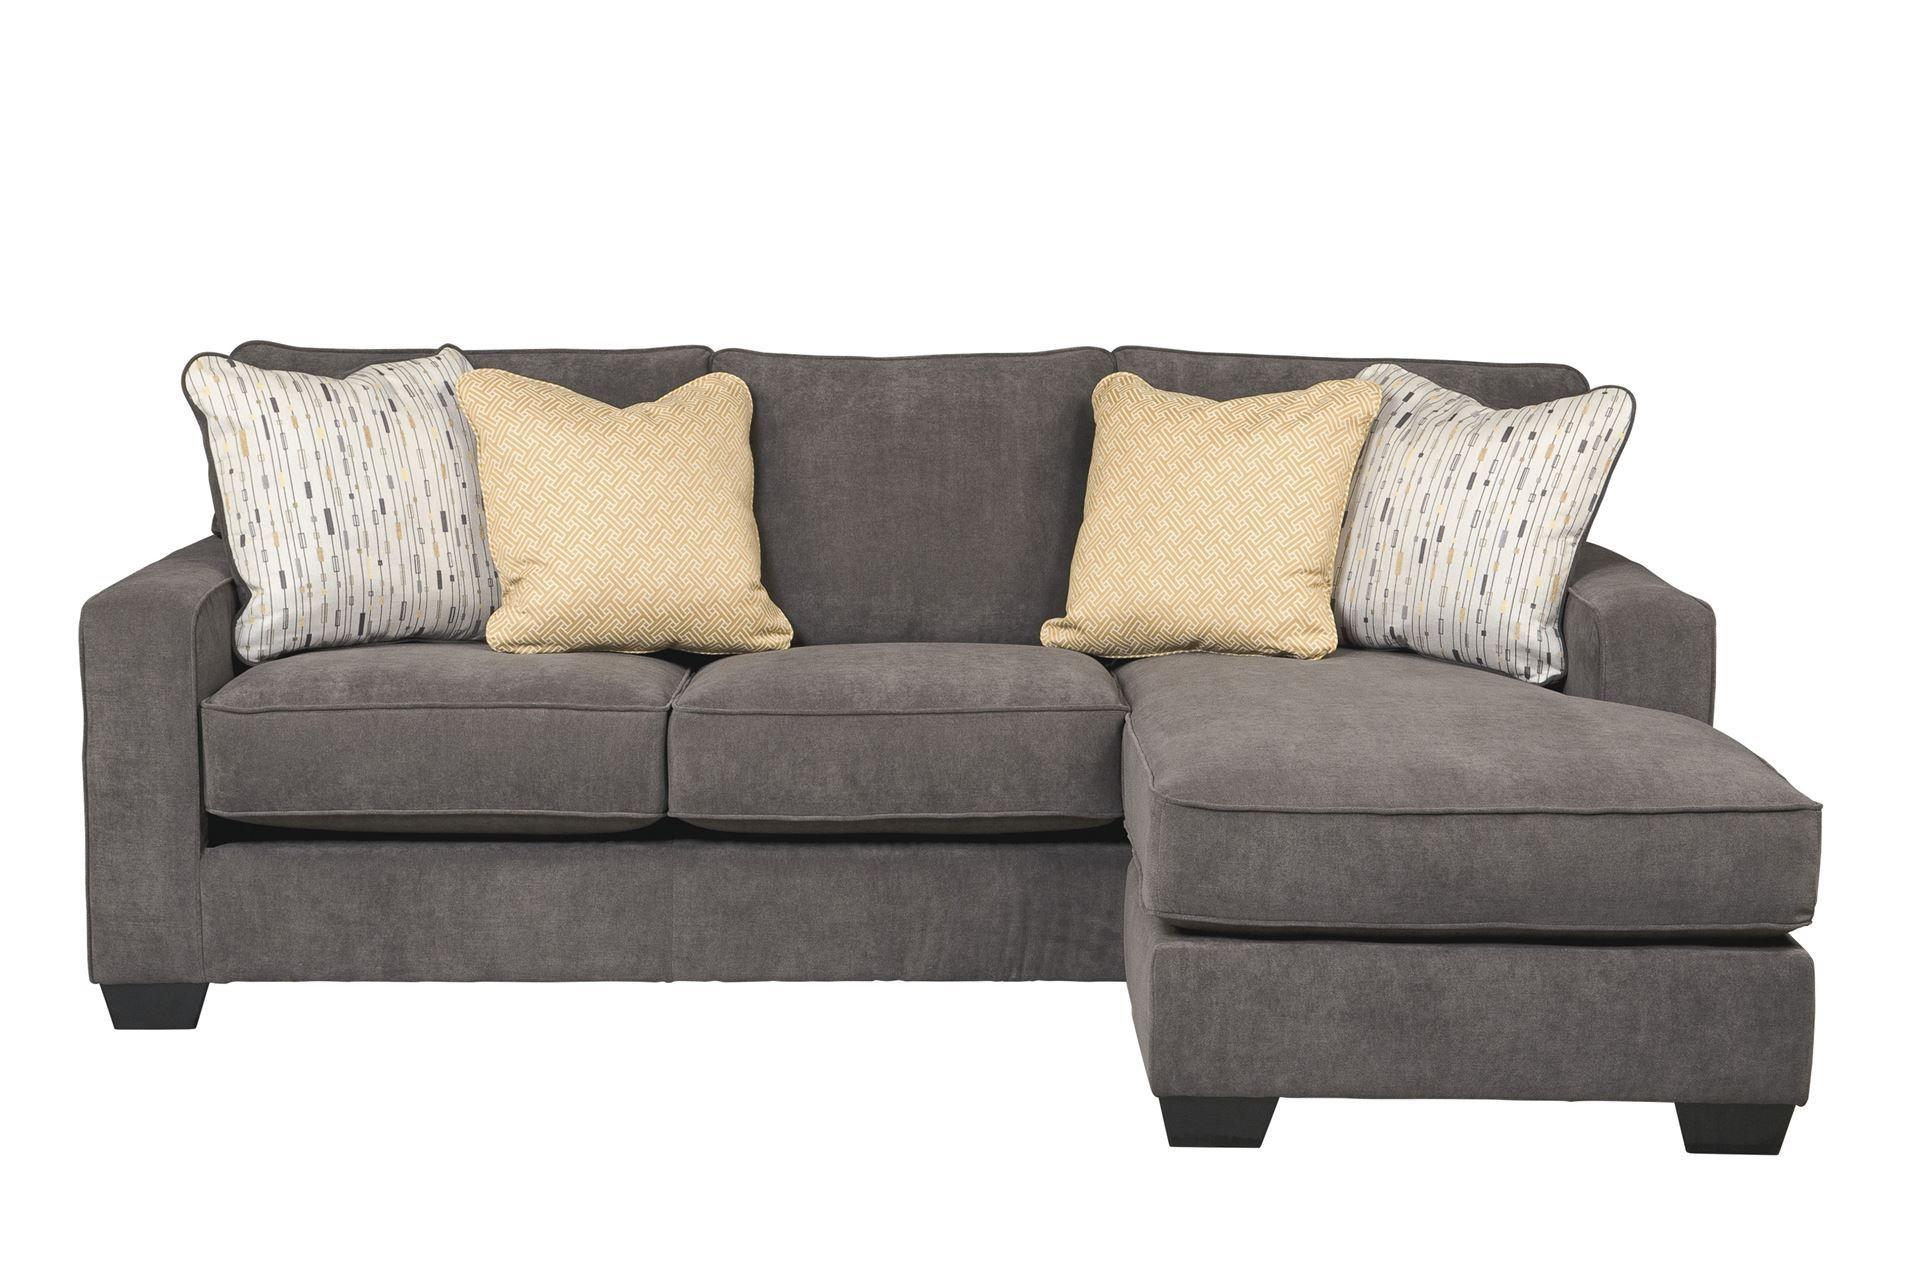 marco gray chaise sofa fortuna sittard vs helmond sport sofascore sectional design expendable